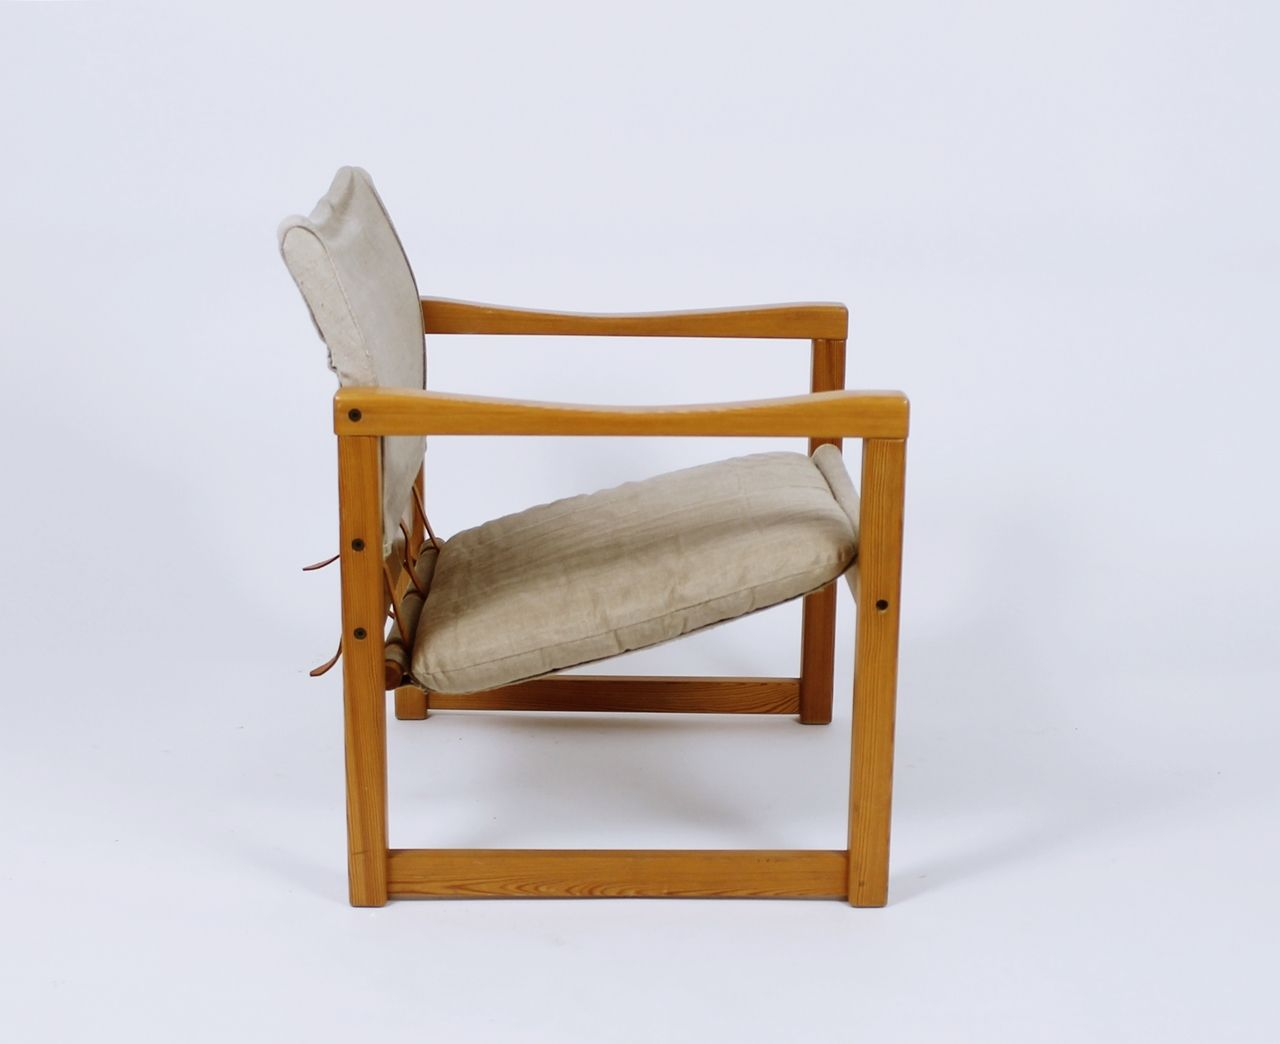 schwedische diana safari st hle von karin mobring f r ikea. Black Bedroom Furniture Sets. Home Design Ideas